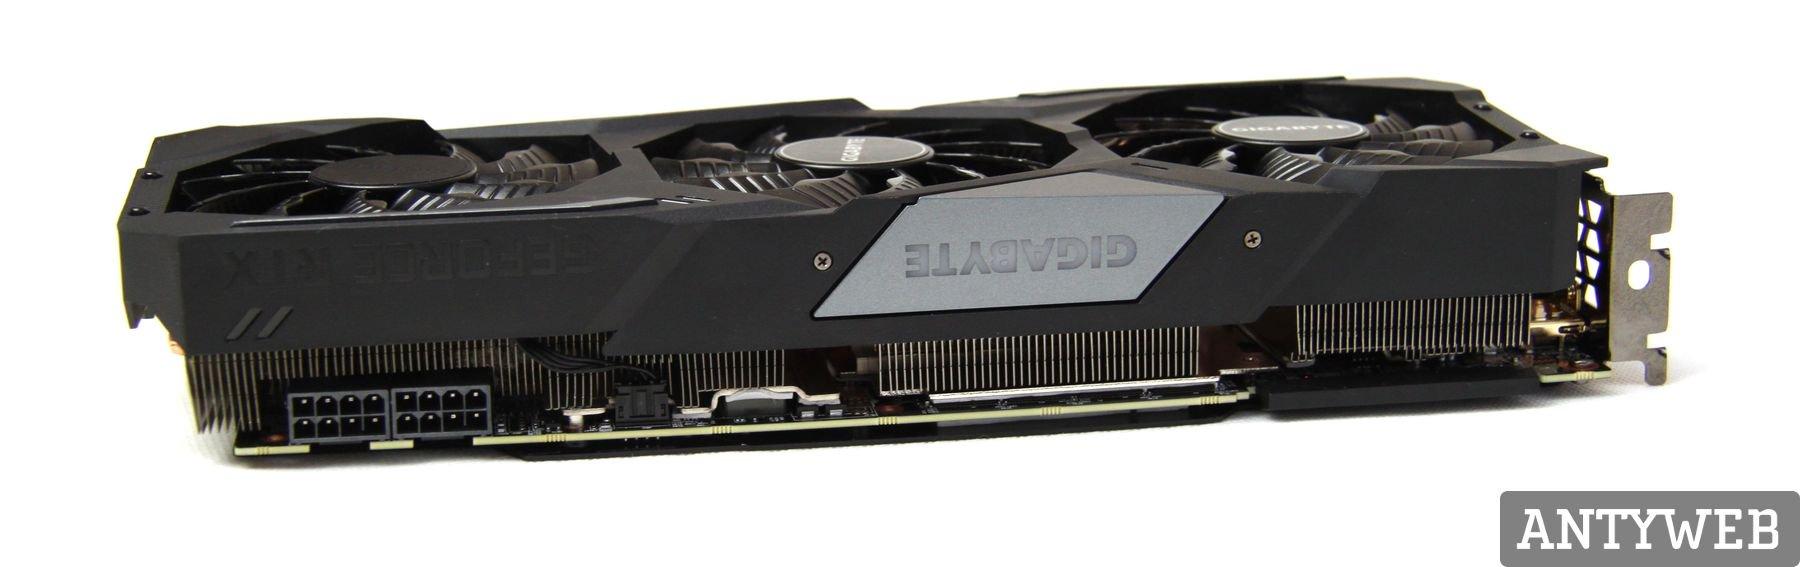 Recenzja Gigabyte GeForce RTX 2080Ti Gaming OC 11G